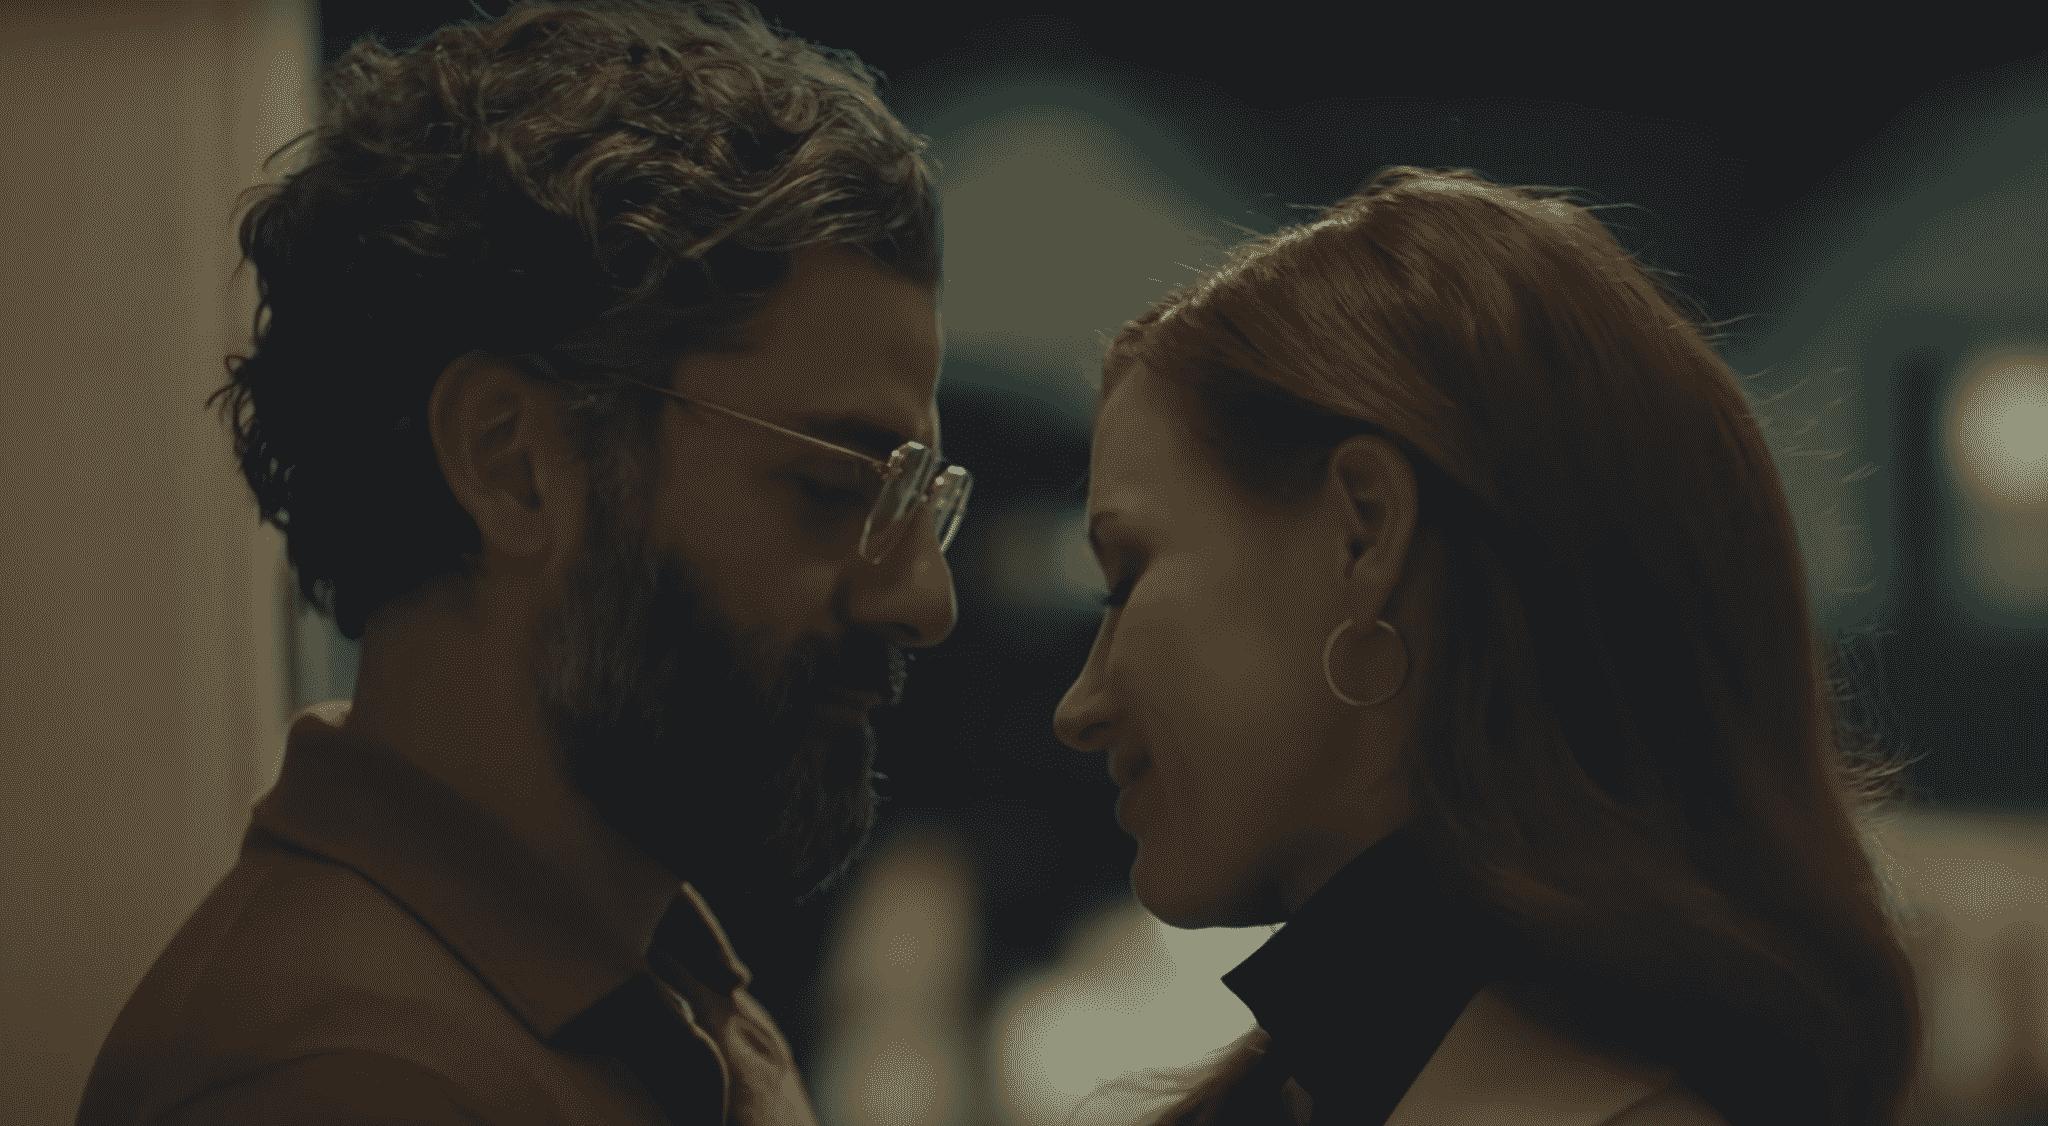 Scene da un matrimonio - Cinematographe.it